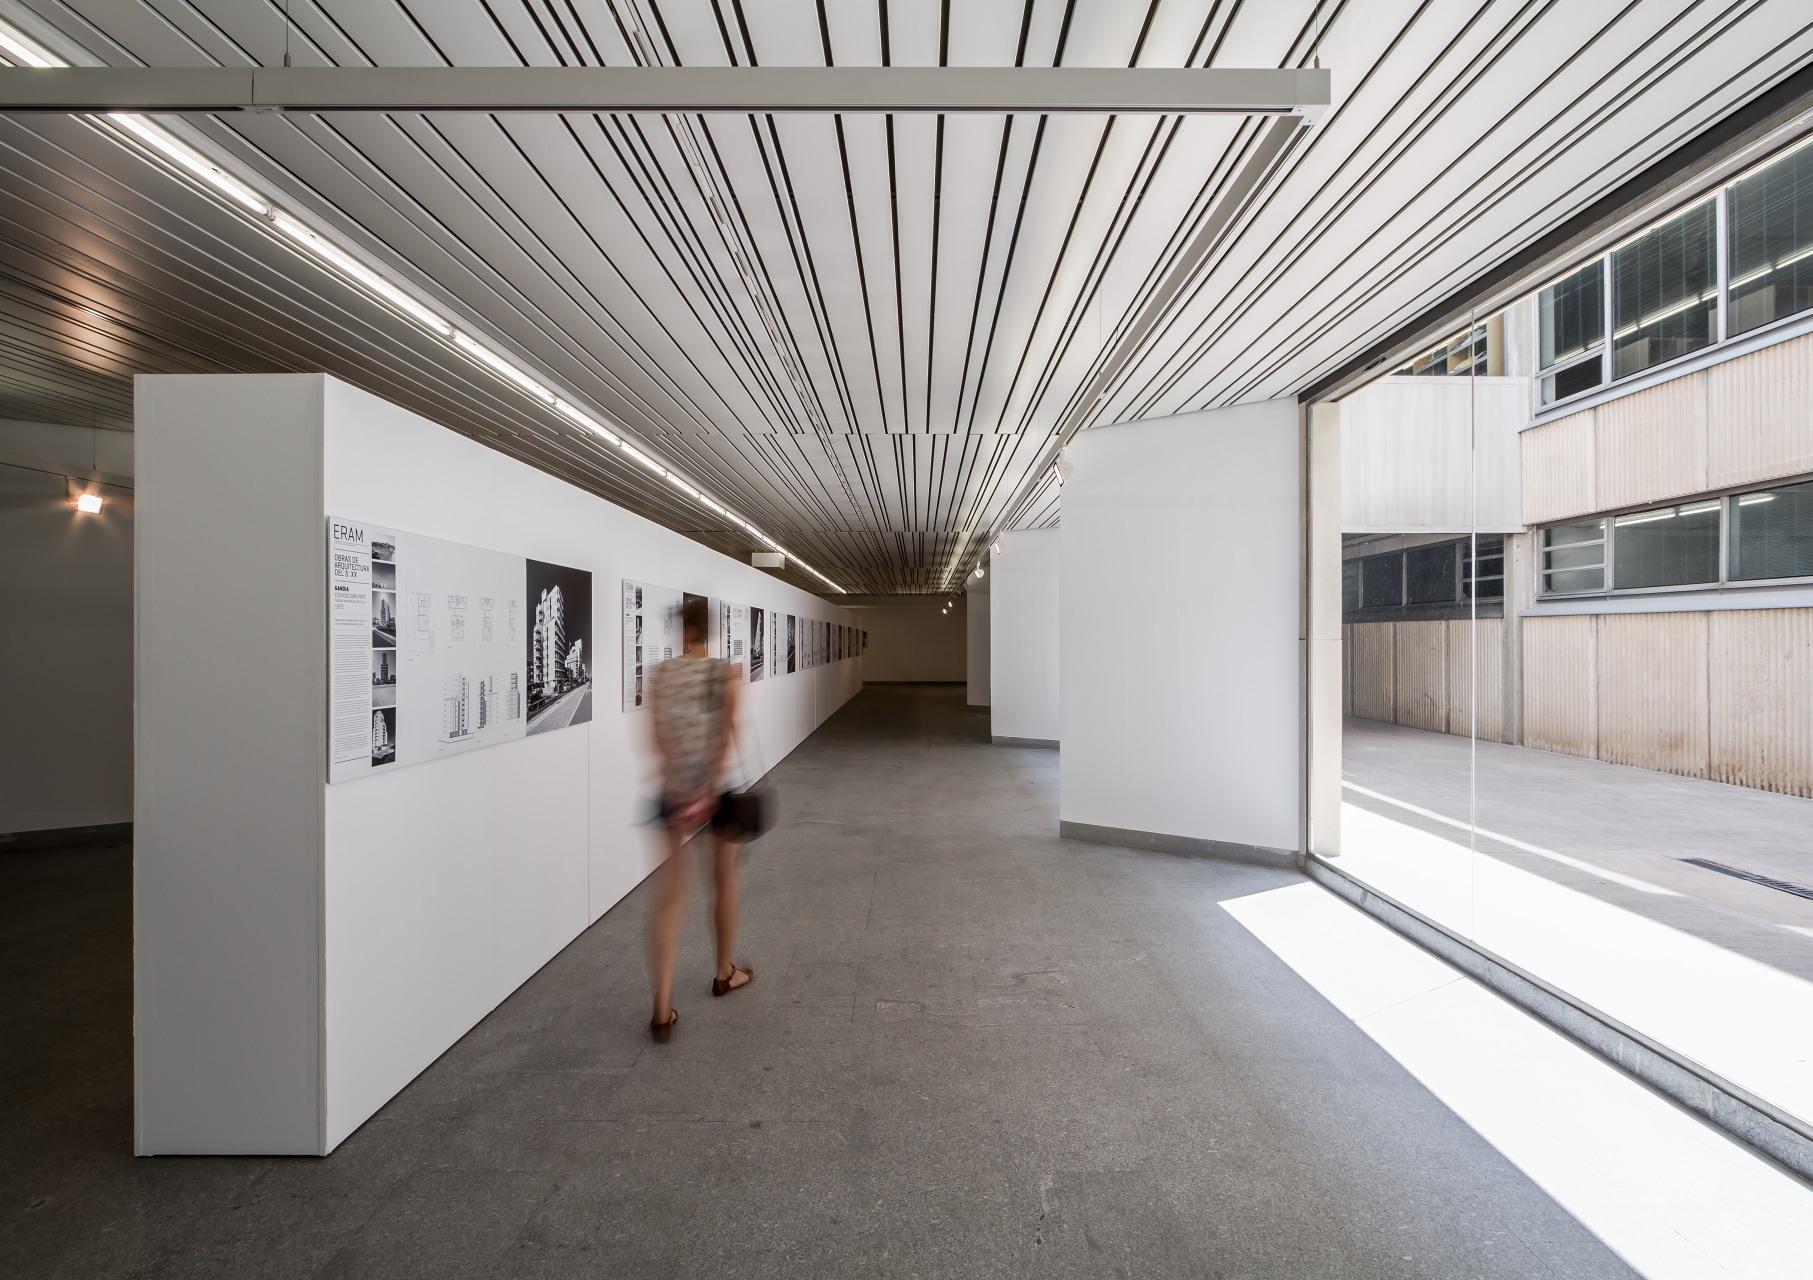 fotografia-arquitectura-valencia-german-cabo-upv-etsav-eram-exposicion (6)